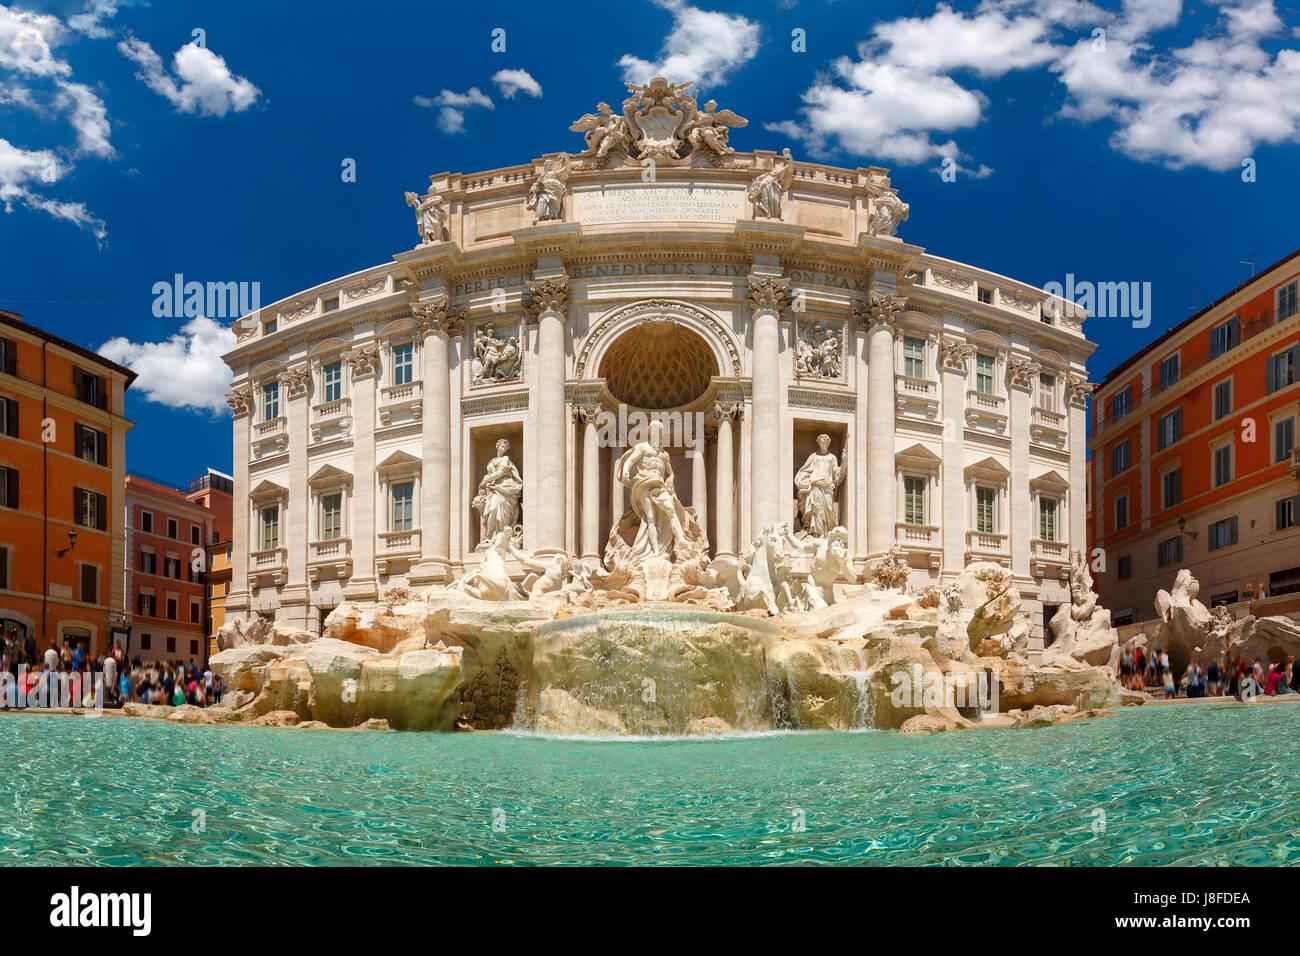 Trevi Fountain or Fontana di Trevi in Rome, Italy - Stock Image